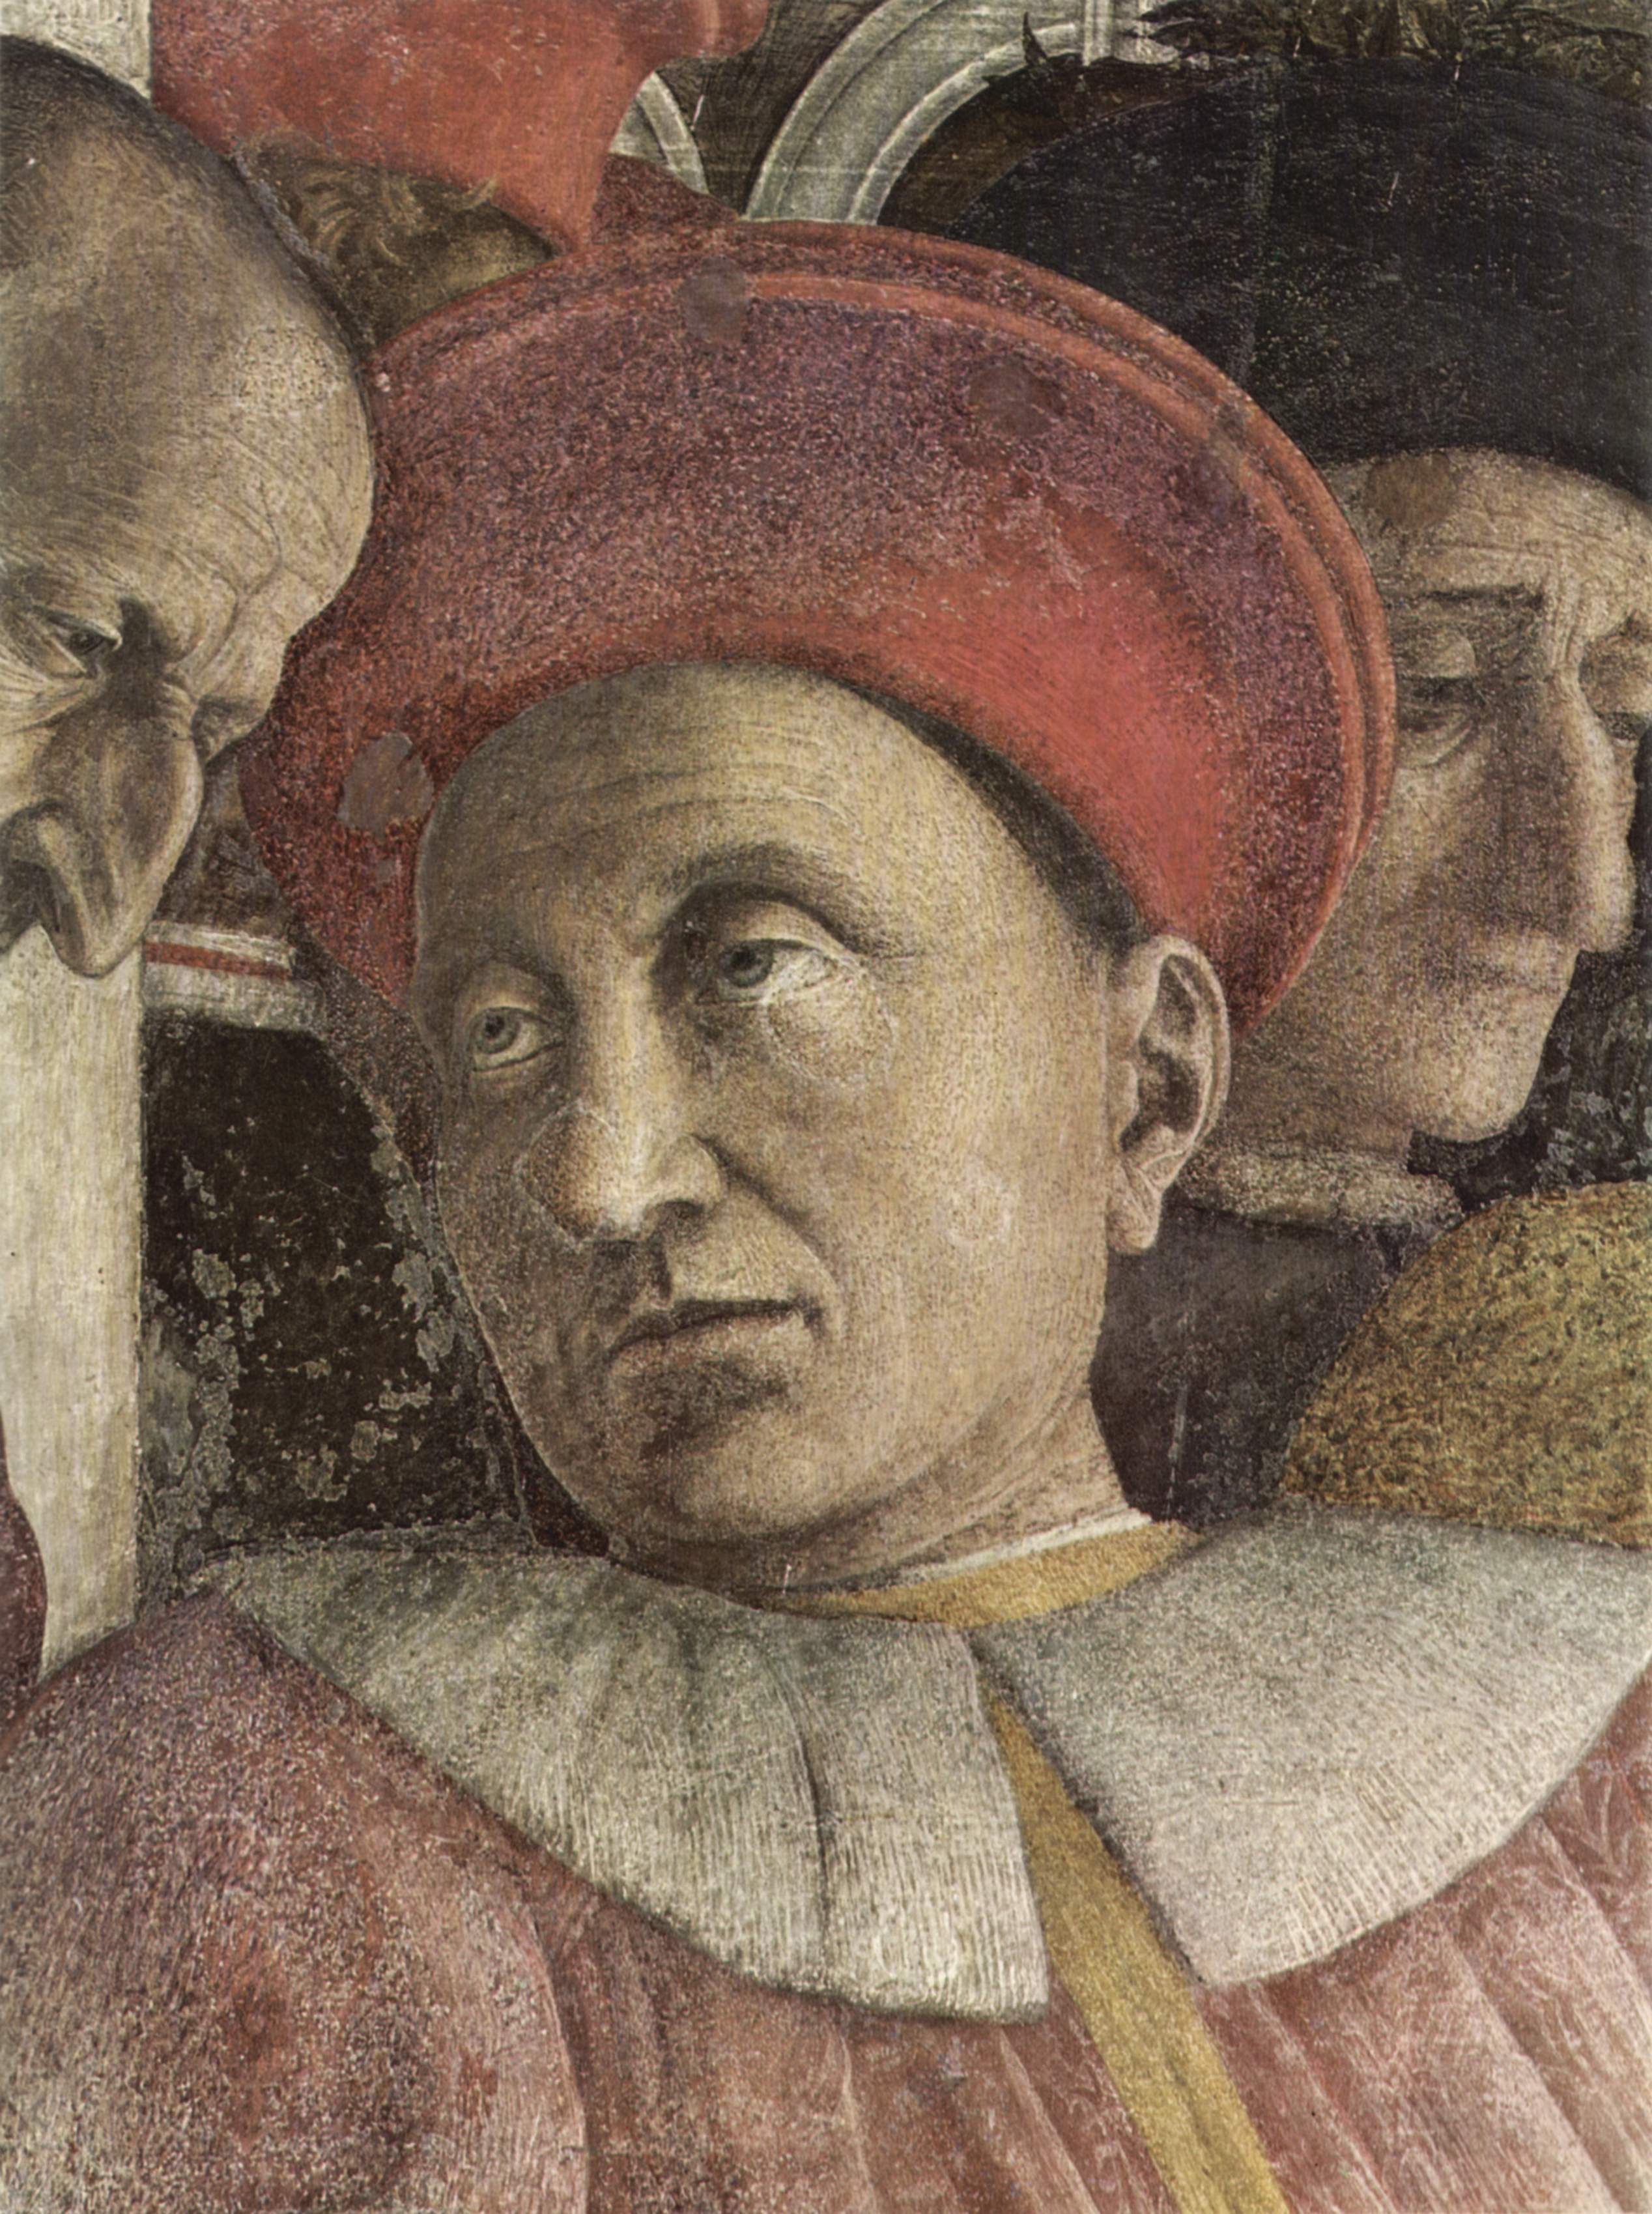 Andrea Mantegna, detail of Ludovico Gonzaga, Camera degli Sposi, 1465-74, fresco, Ducal Palace, Mantua